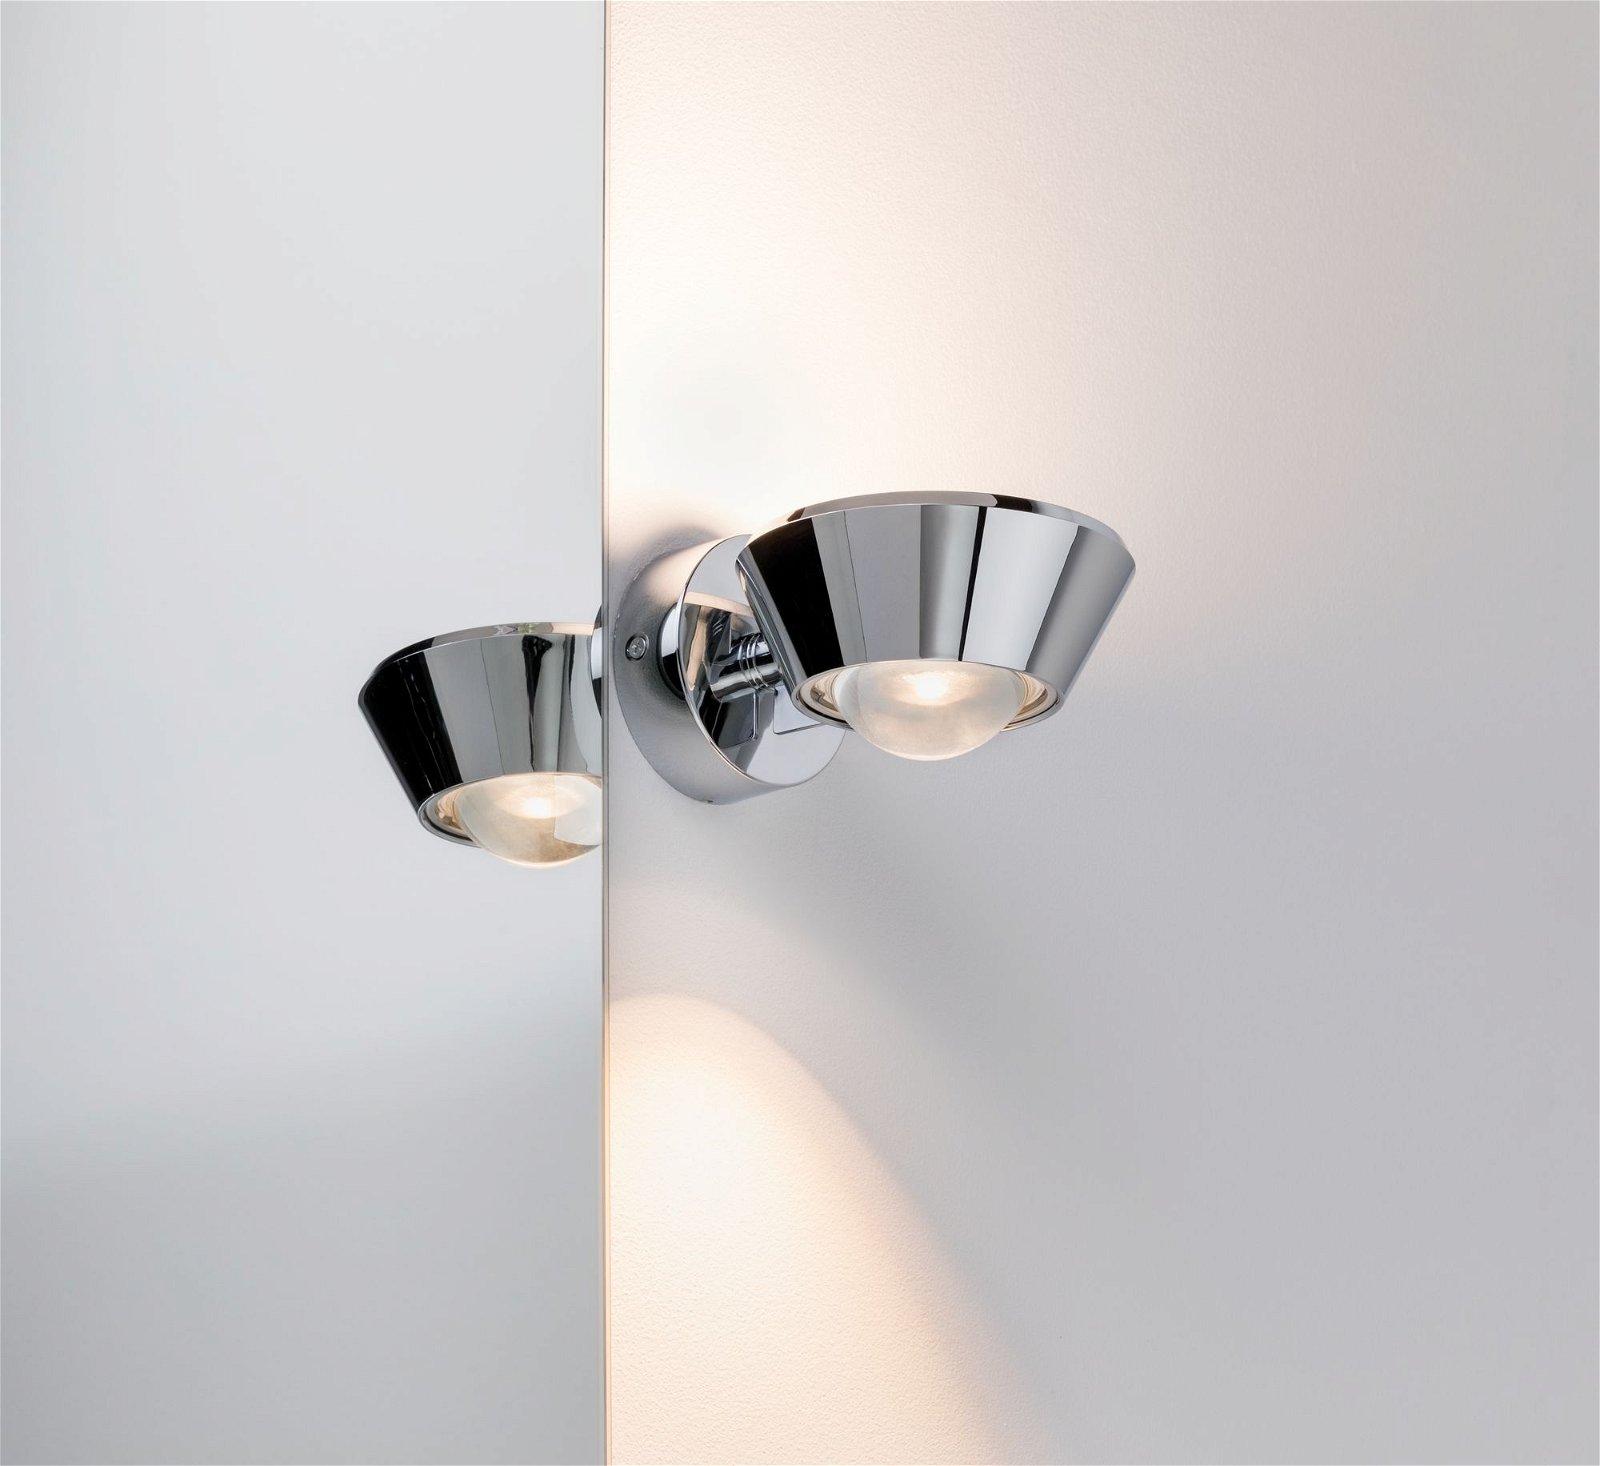 LED Wandleuchte Sabik IP44 2700K 570lm 230V 9 / 1x4W Chrom